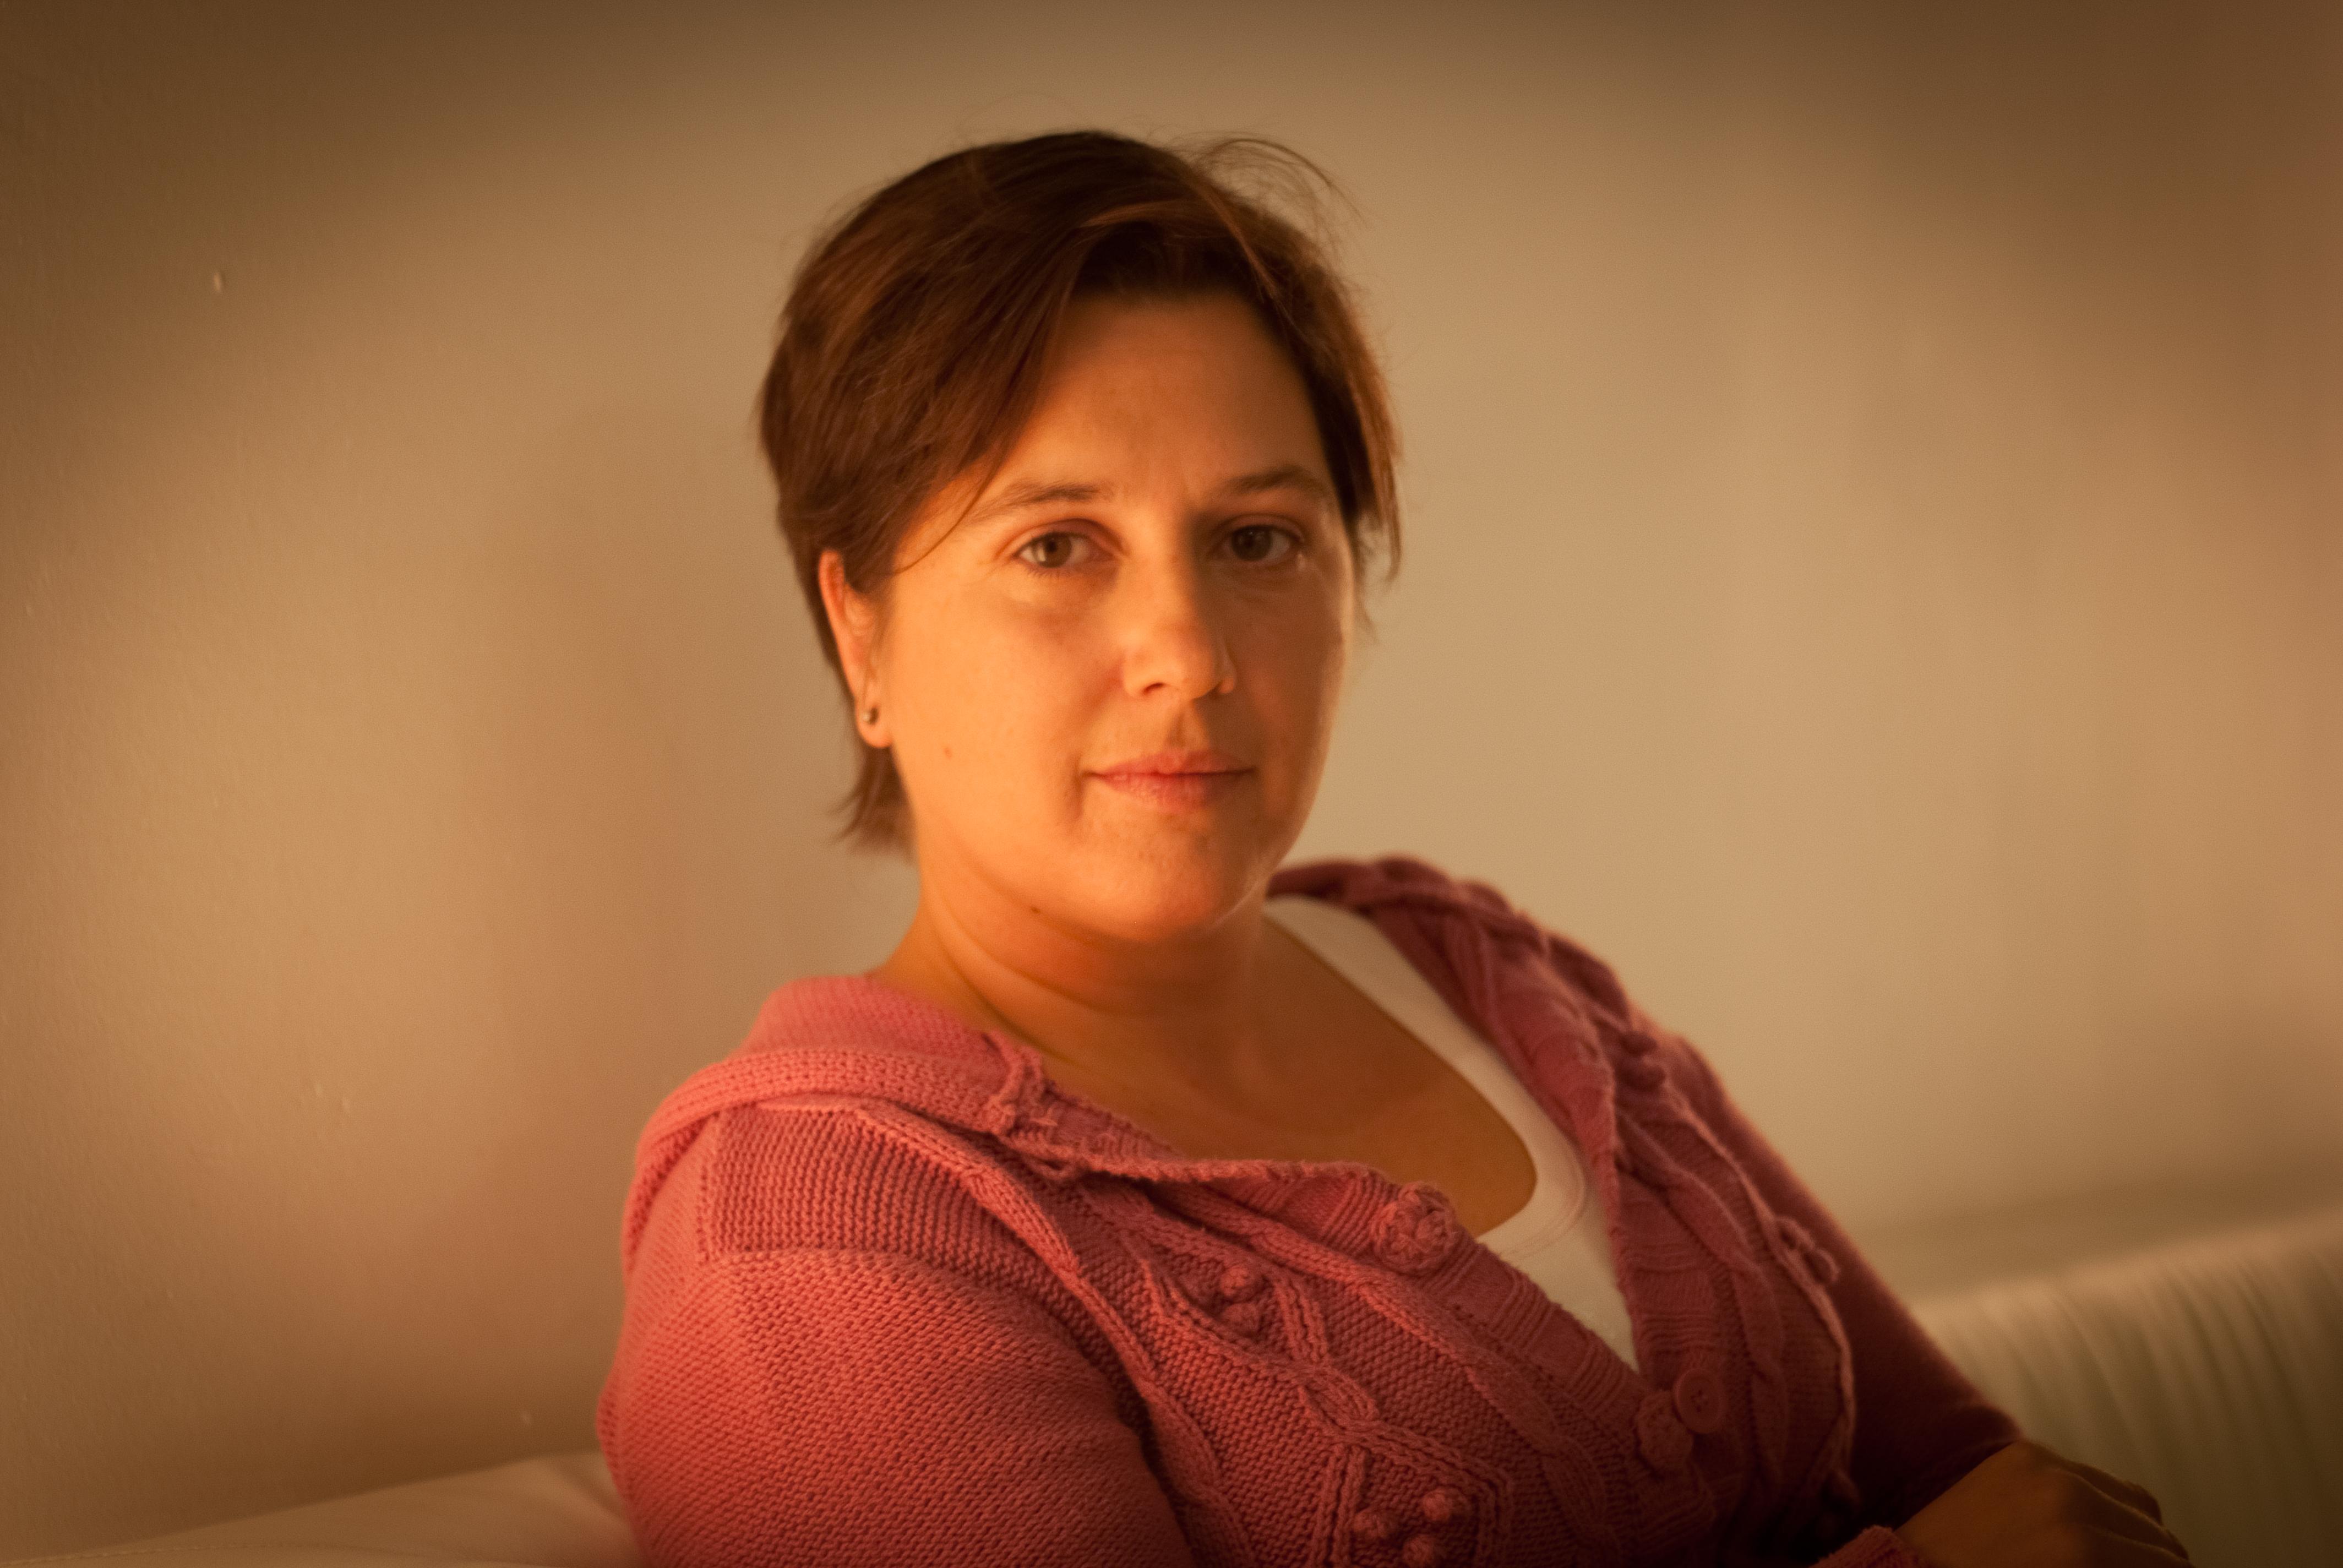 A autora ofreceu en 'Culpable' un texto con hibridación de xéneros literarios